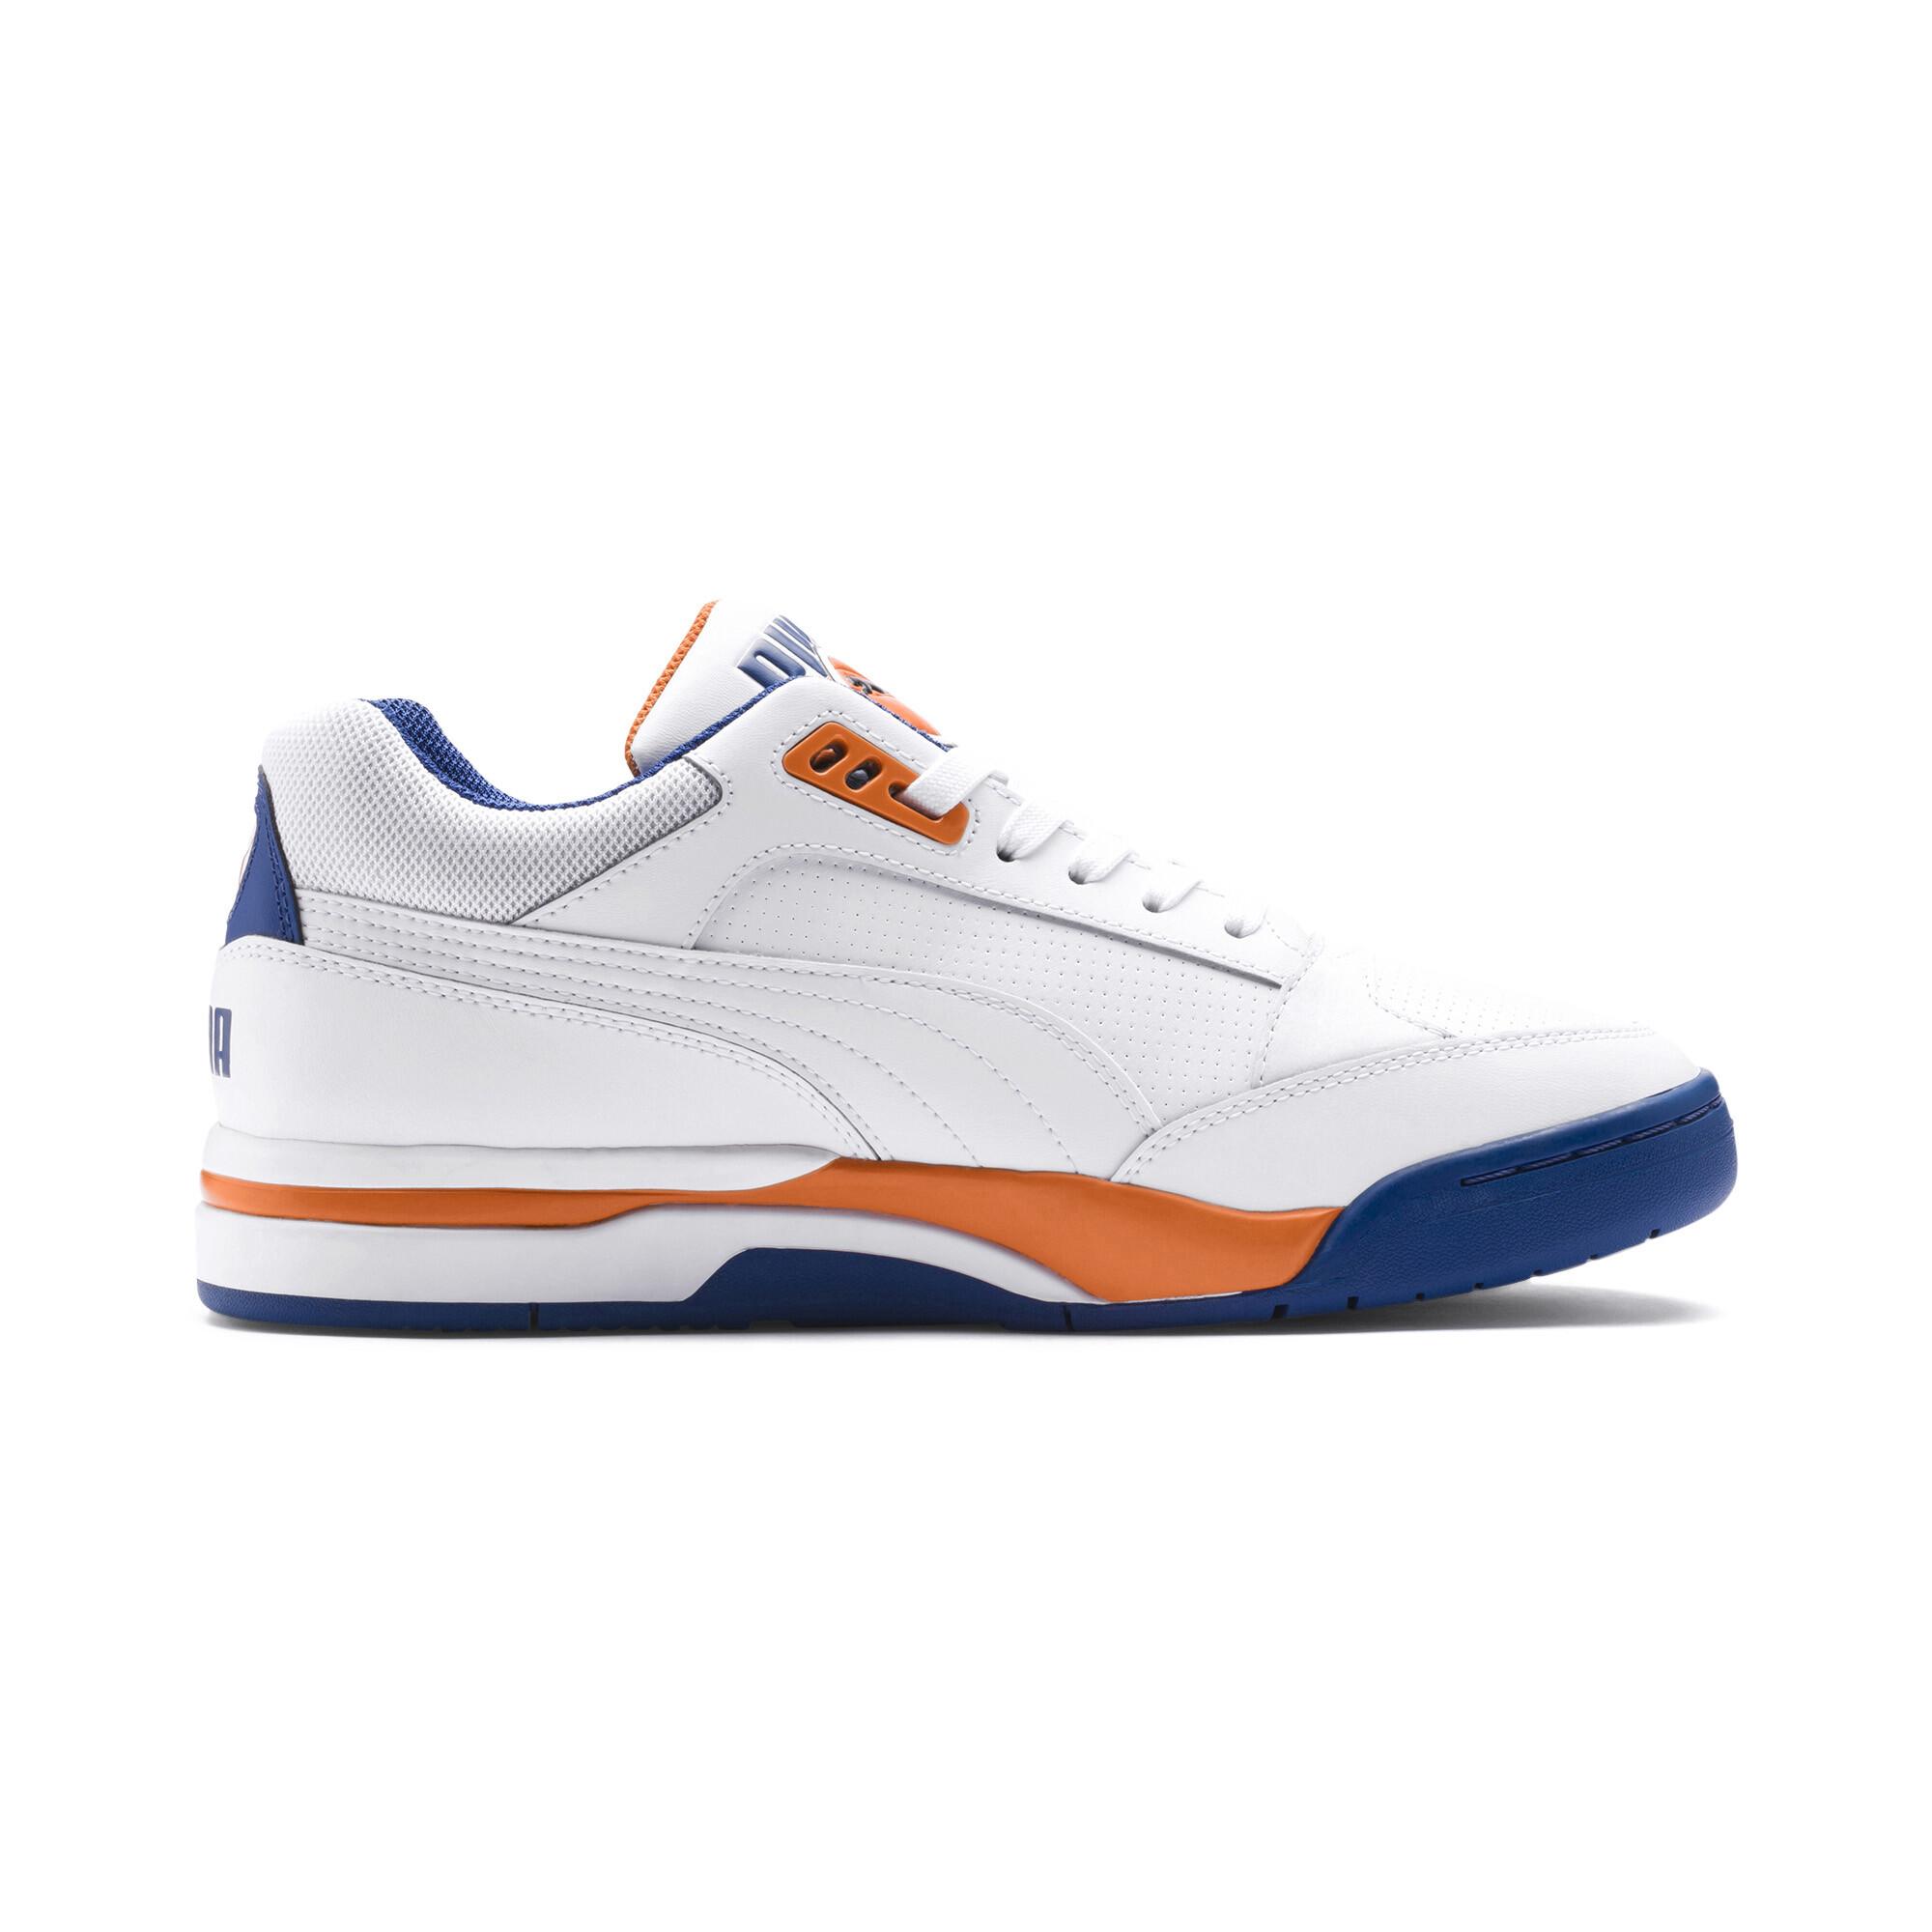 Indexbild 27 - PUMA Palace Guard Sneaker Unisex Schuhe Sport Classics Neu